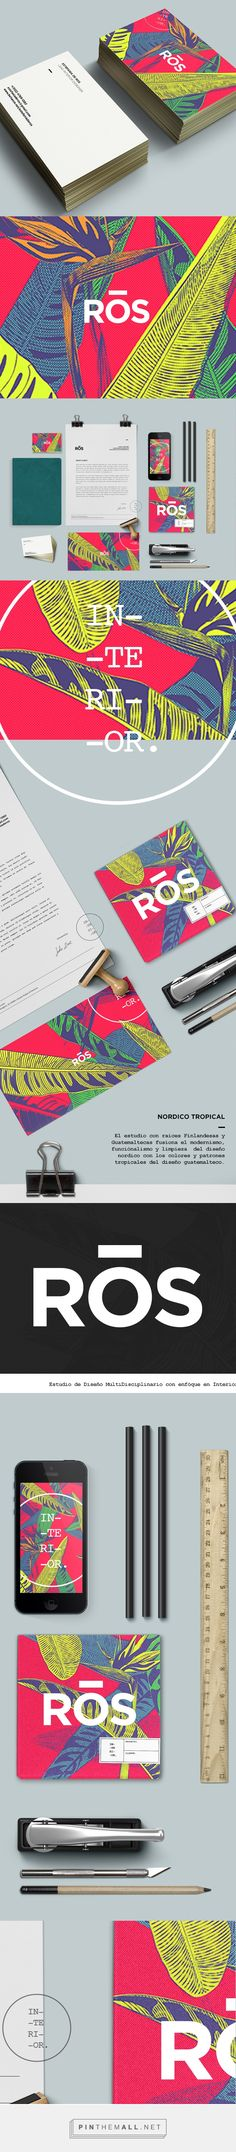 Ros Interior Design Branding on Behance | Fivestar Branding – Design and Branding Agency & Inspiration Gallery